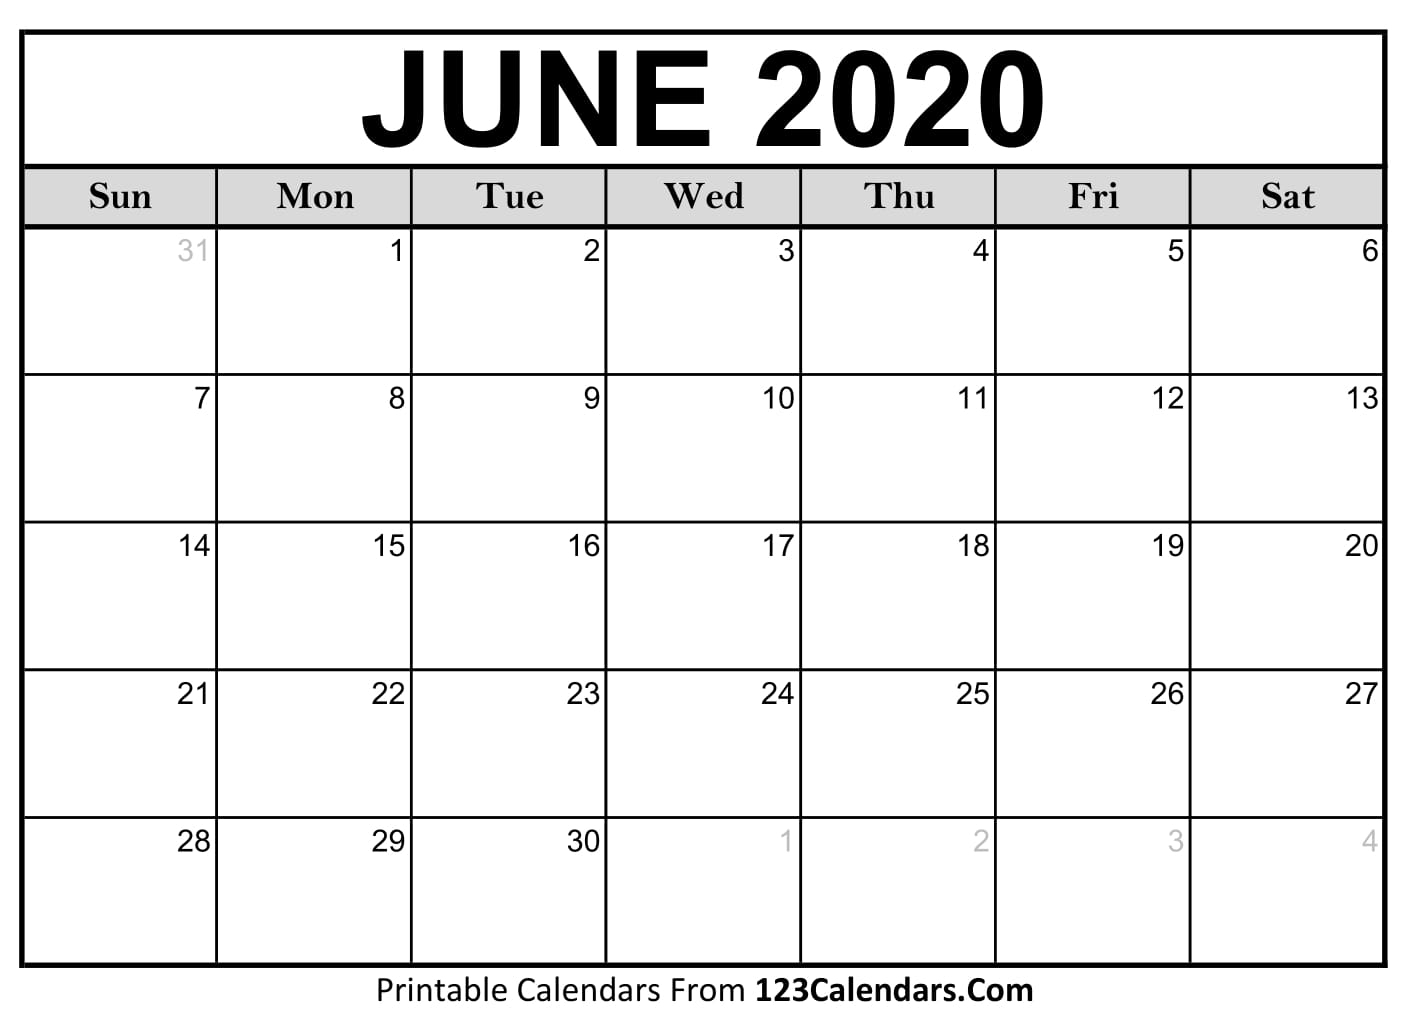 June 2020 Printable Calendar | 123Calendars regarding Printable Calendar June 2019 To June 2020